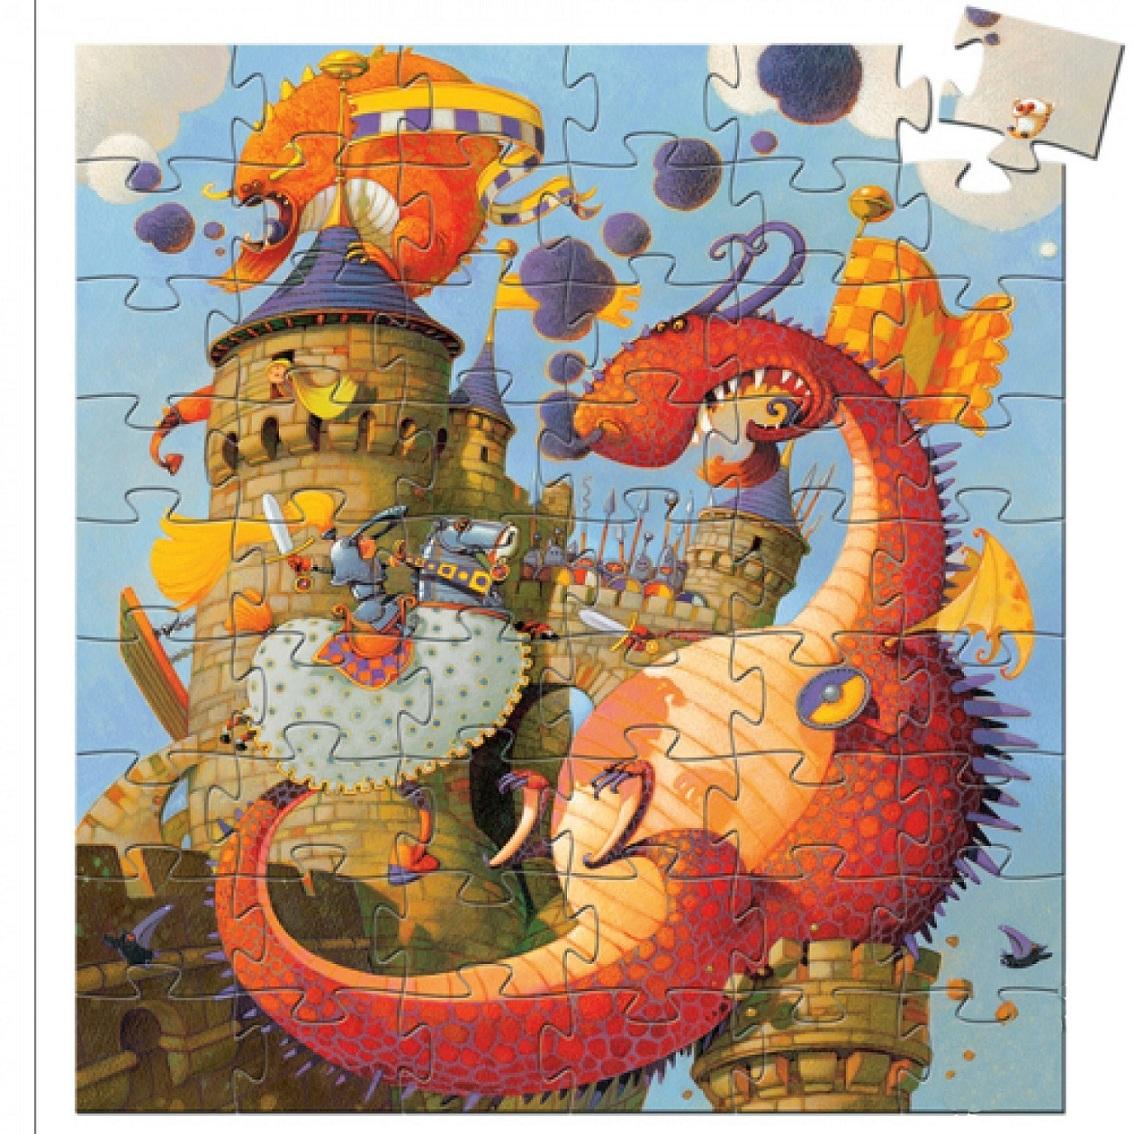 Купить Пазл - Рыцарь и дракон, 54 элемента, Djeco